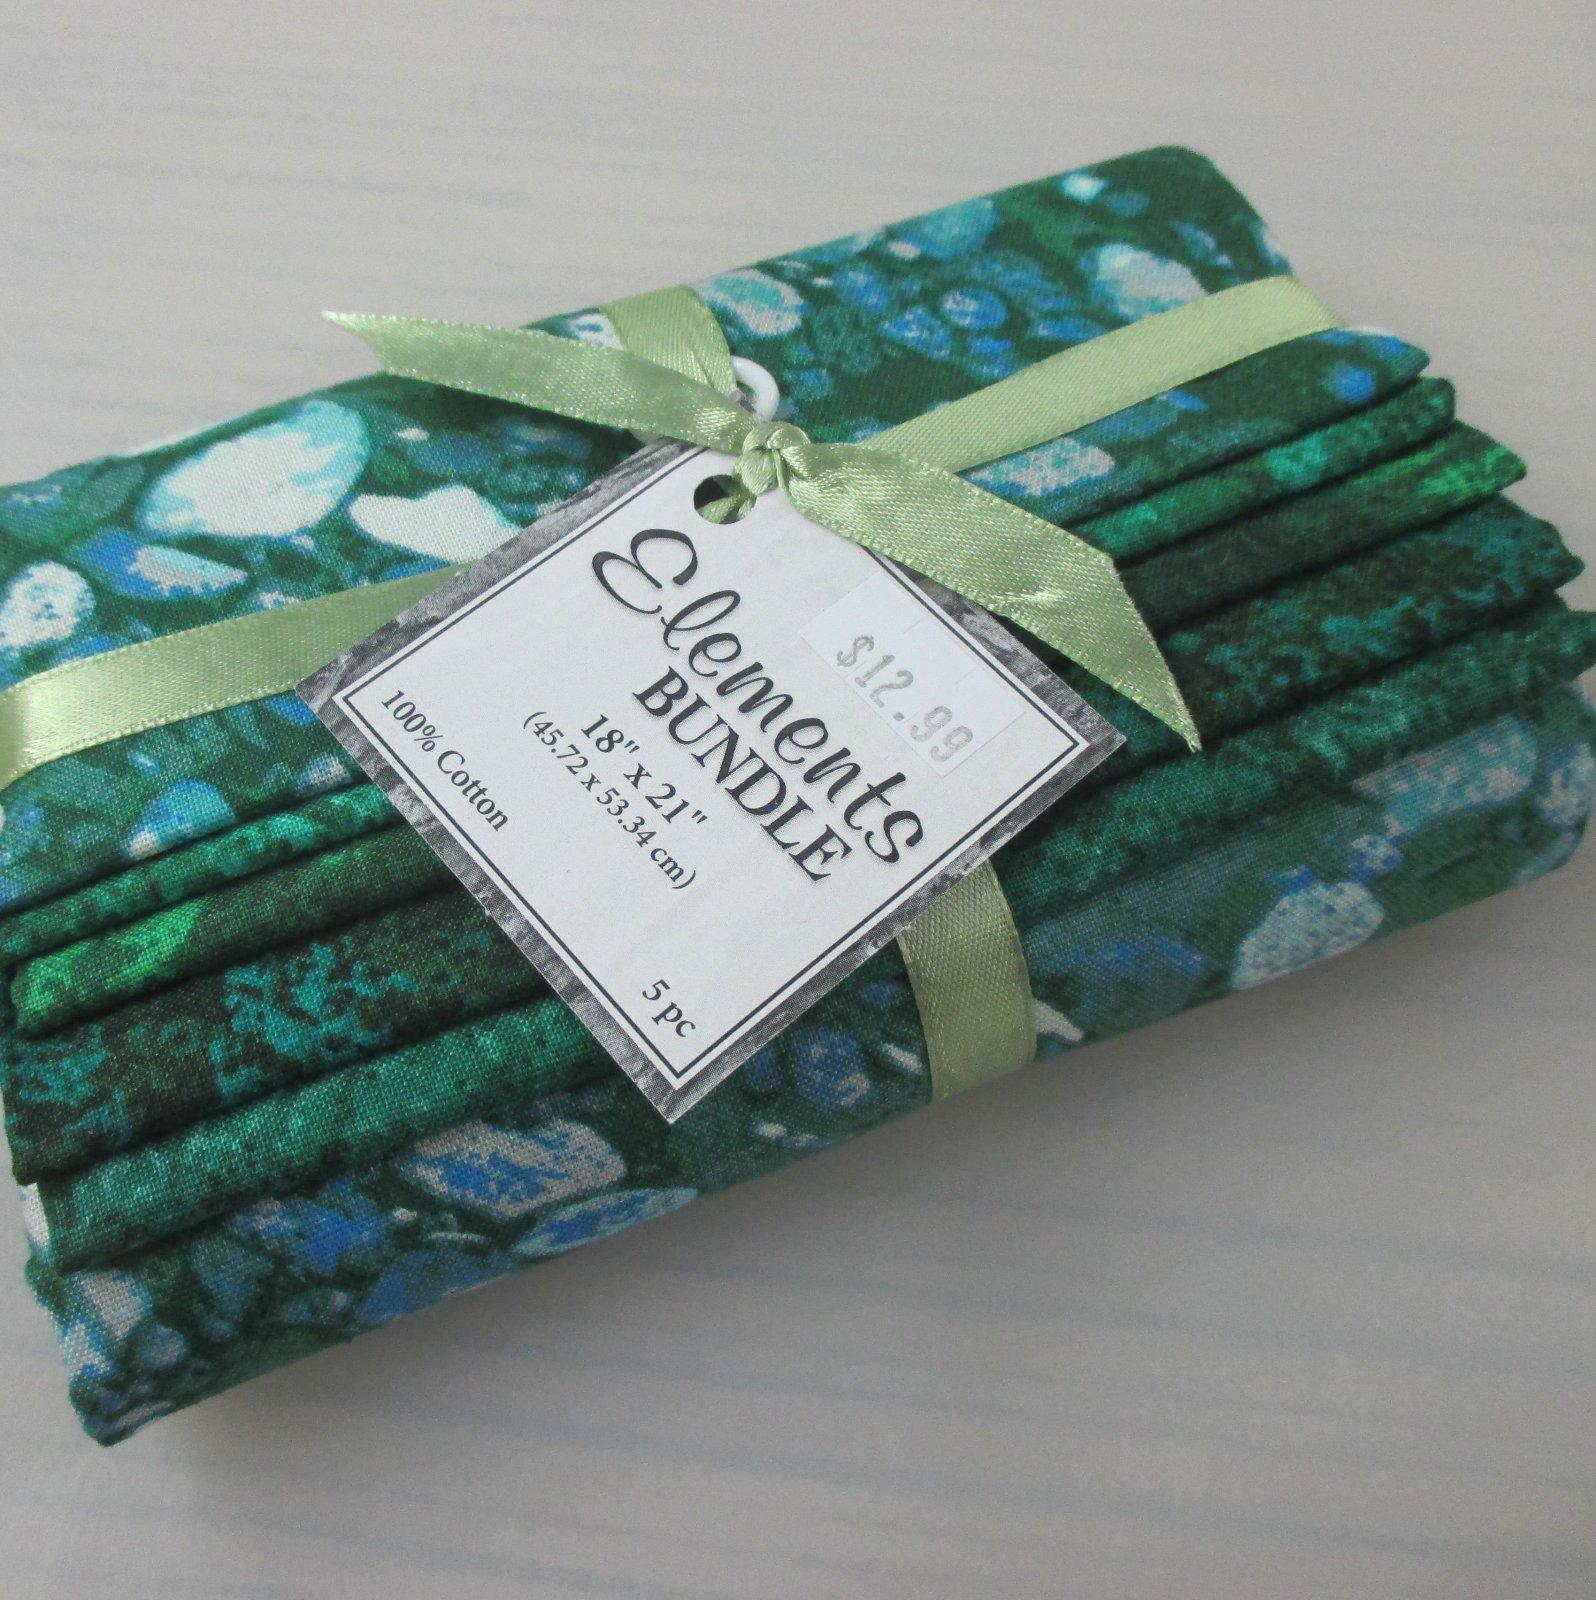 Elements Cool Bundle 1 - Green